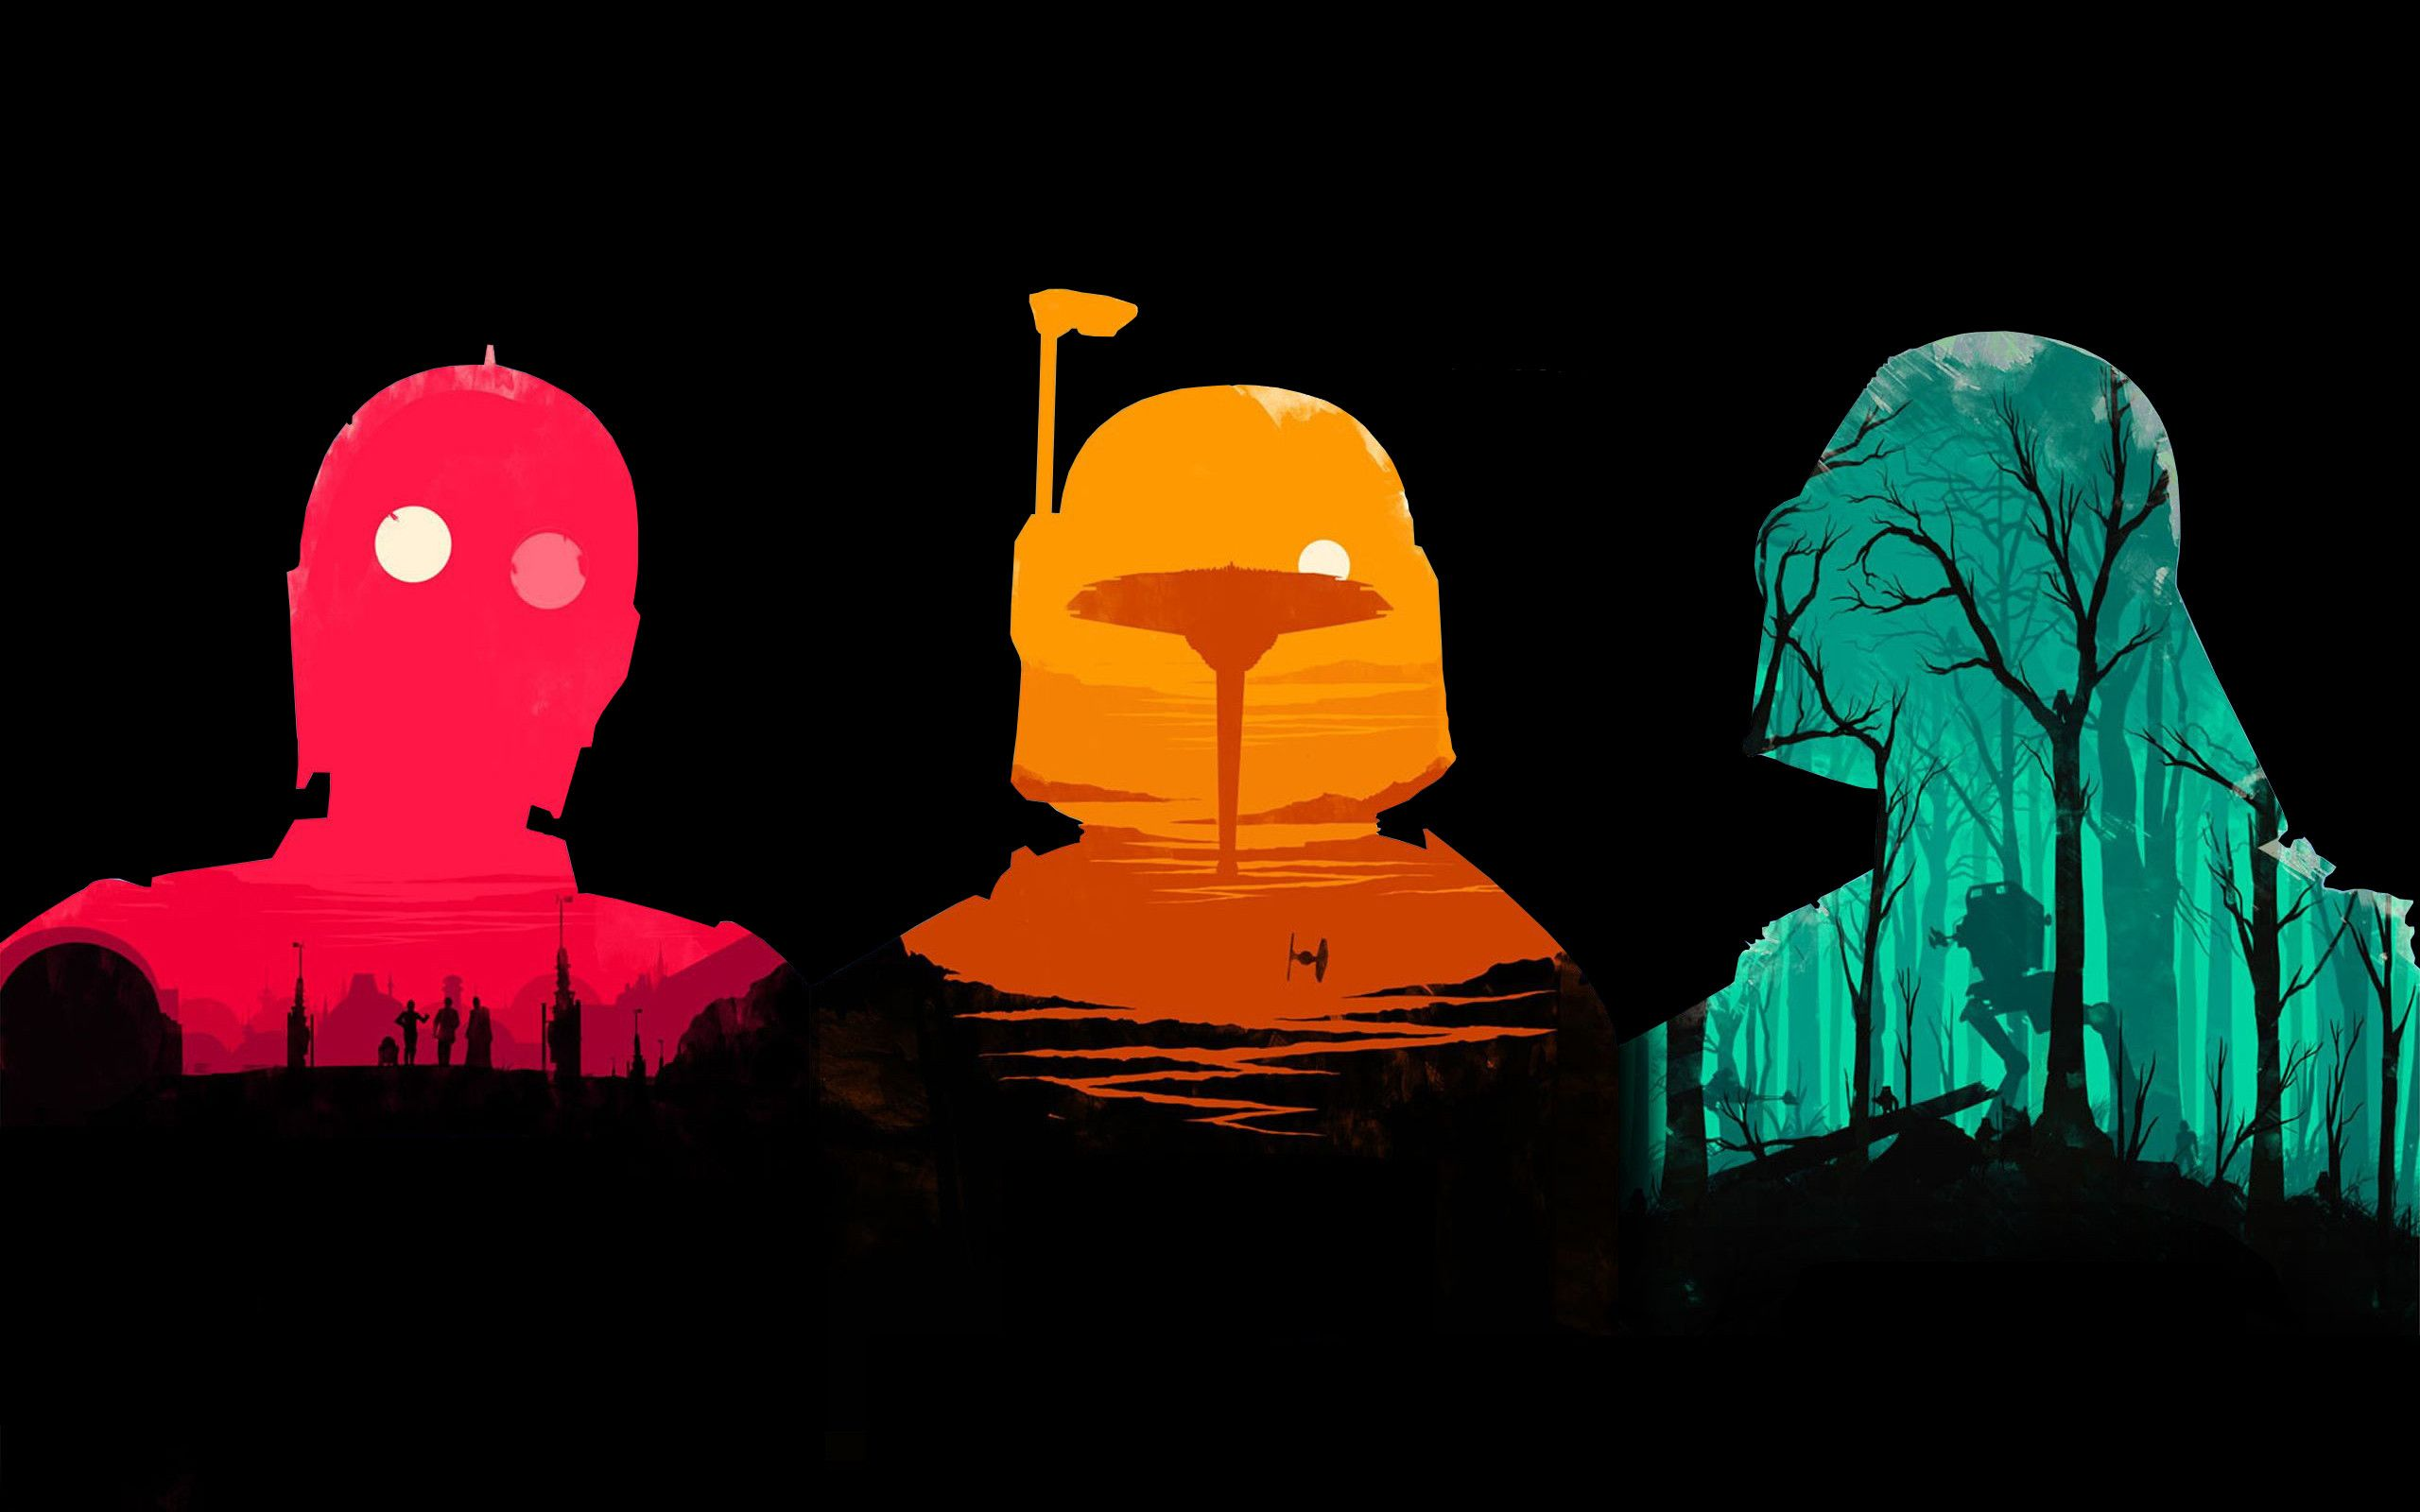 Over 1000 1080p Wallpapers Geeky Wallpaper Star Wars Wallpaper Nerdy Wallpaper